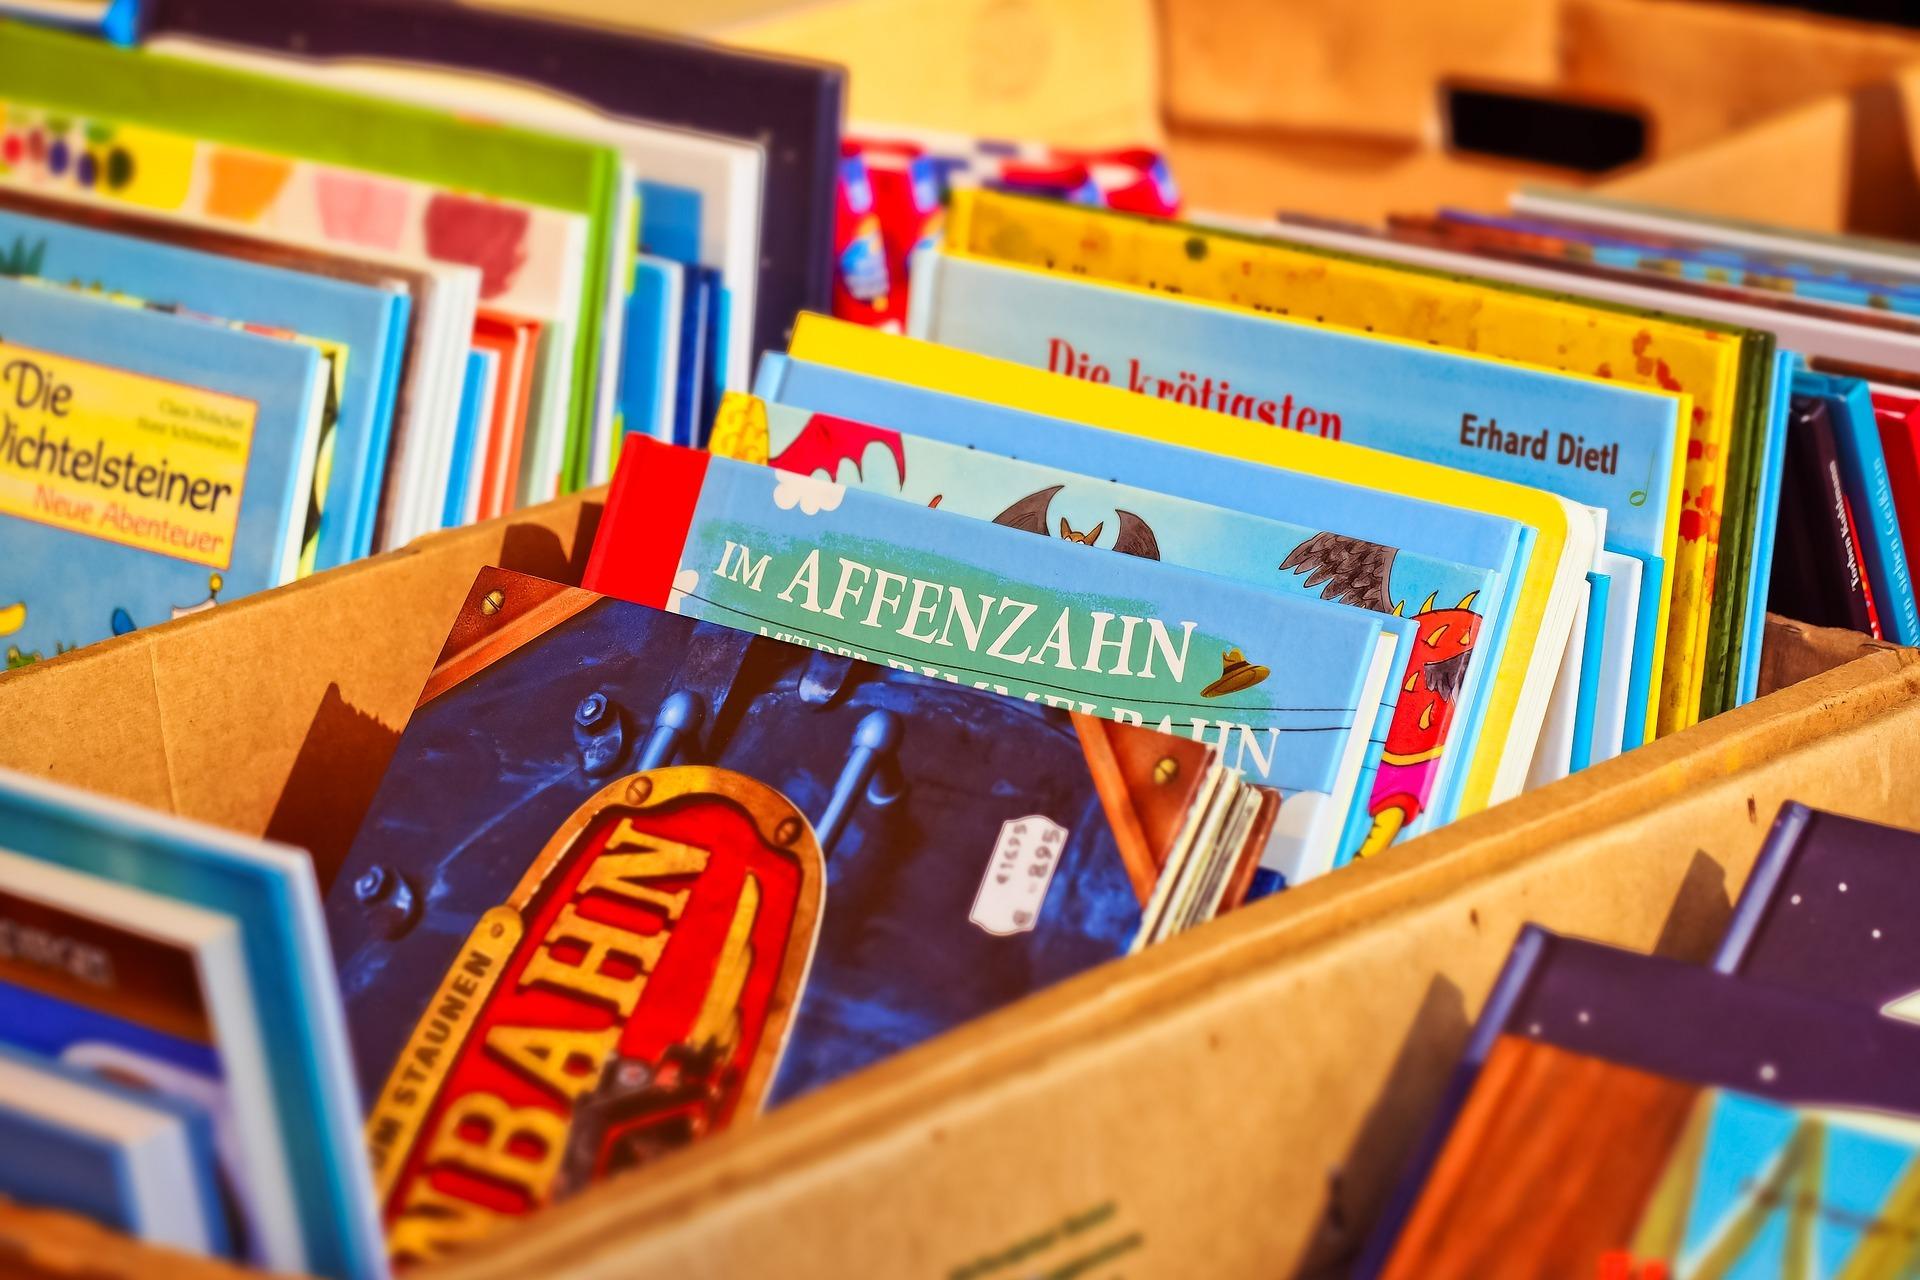 Perché leggere libri ai bambini?